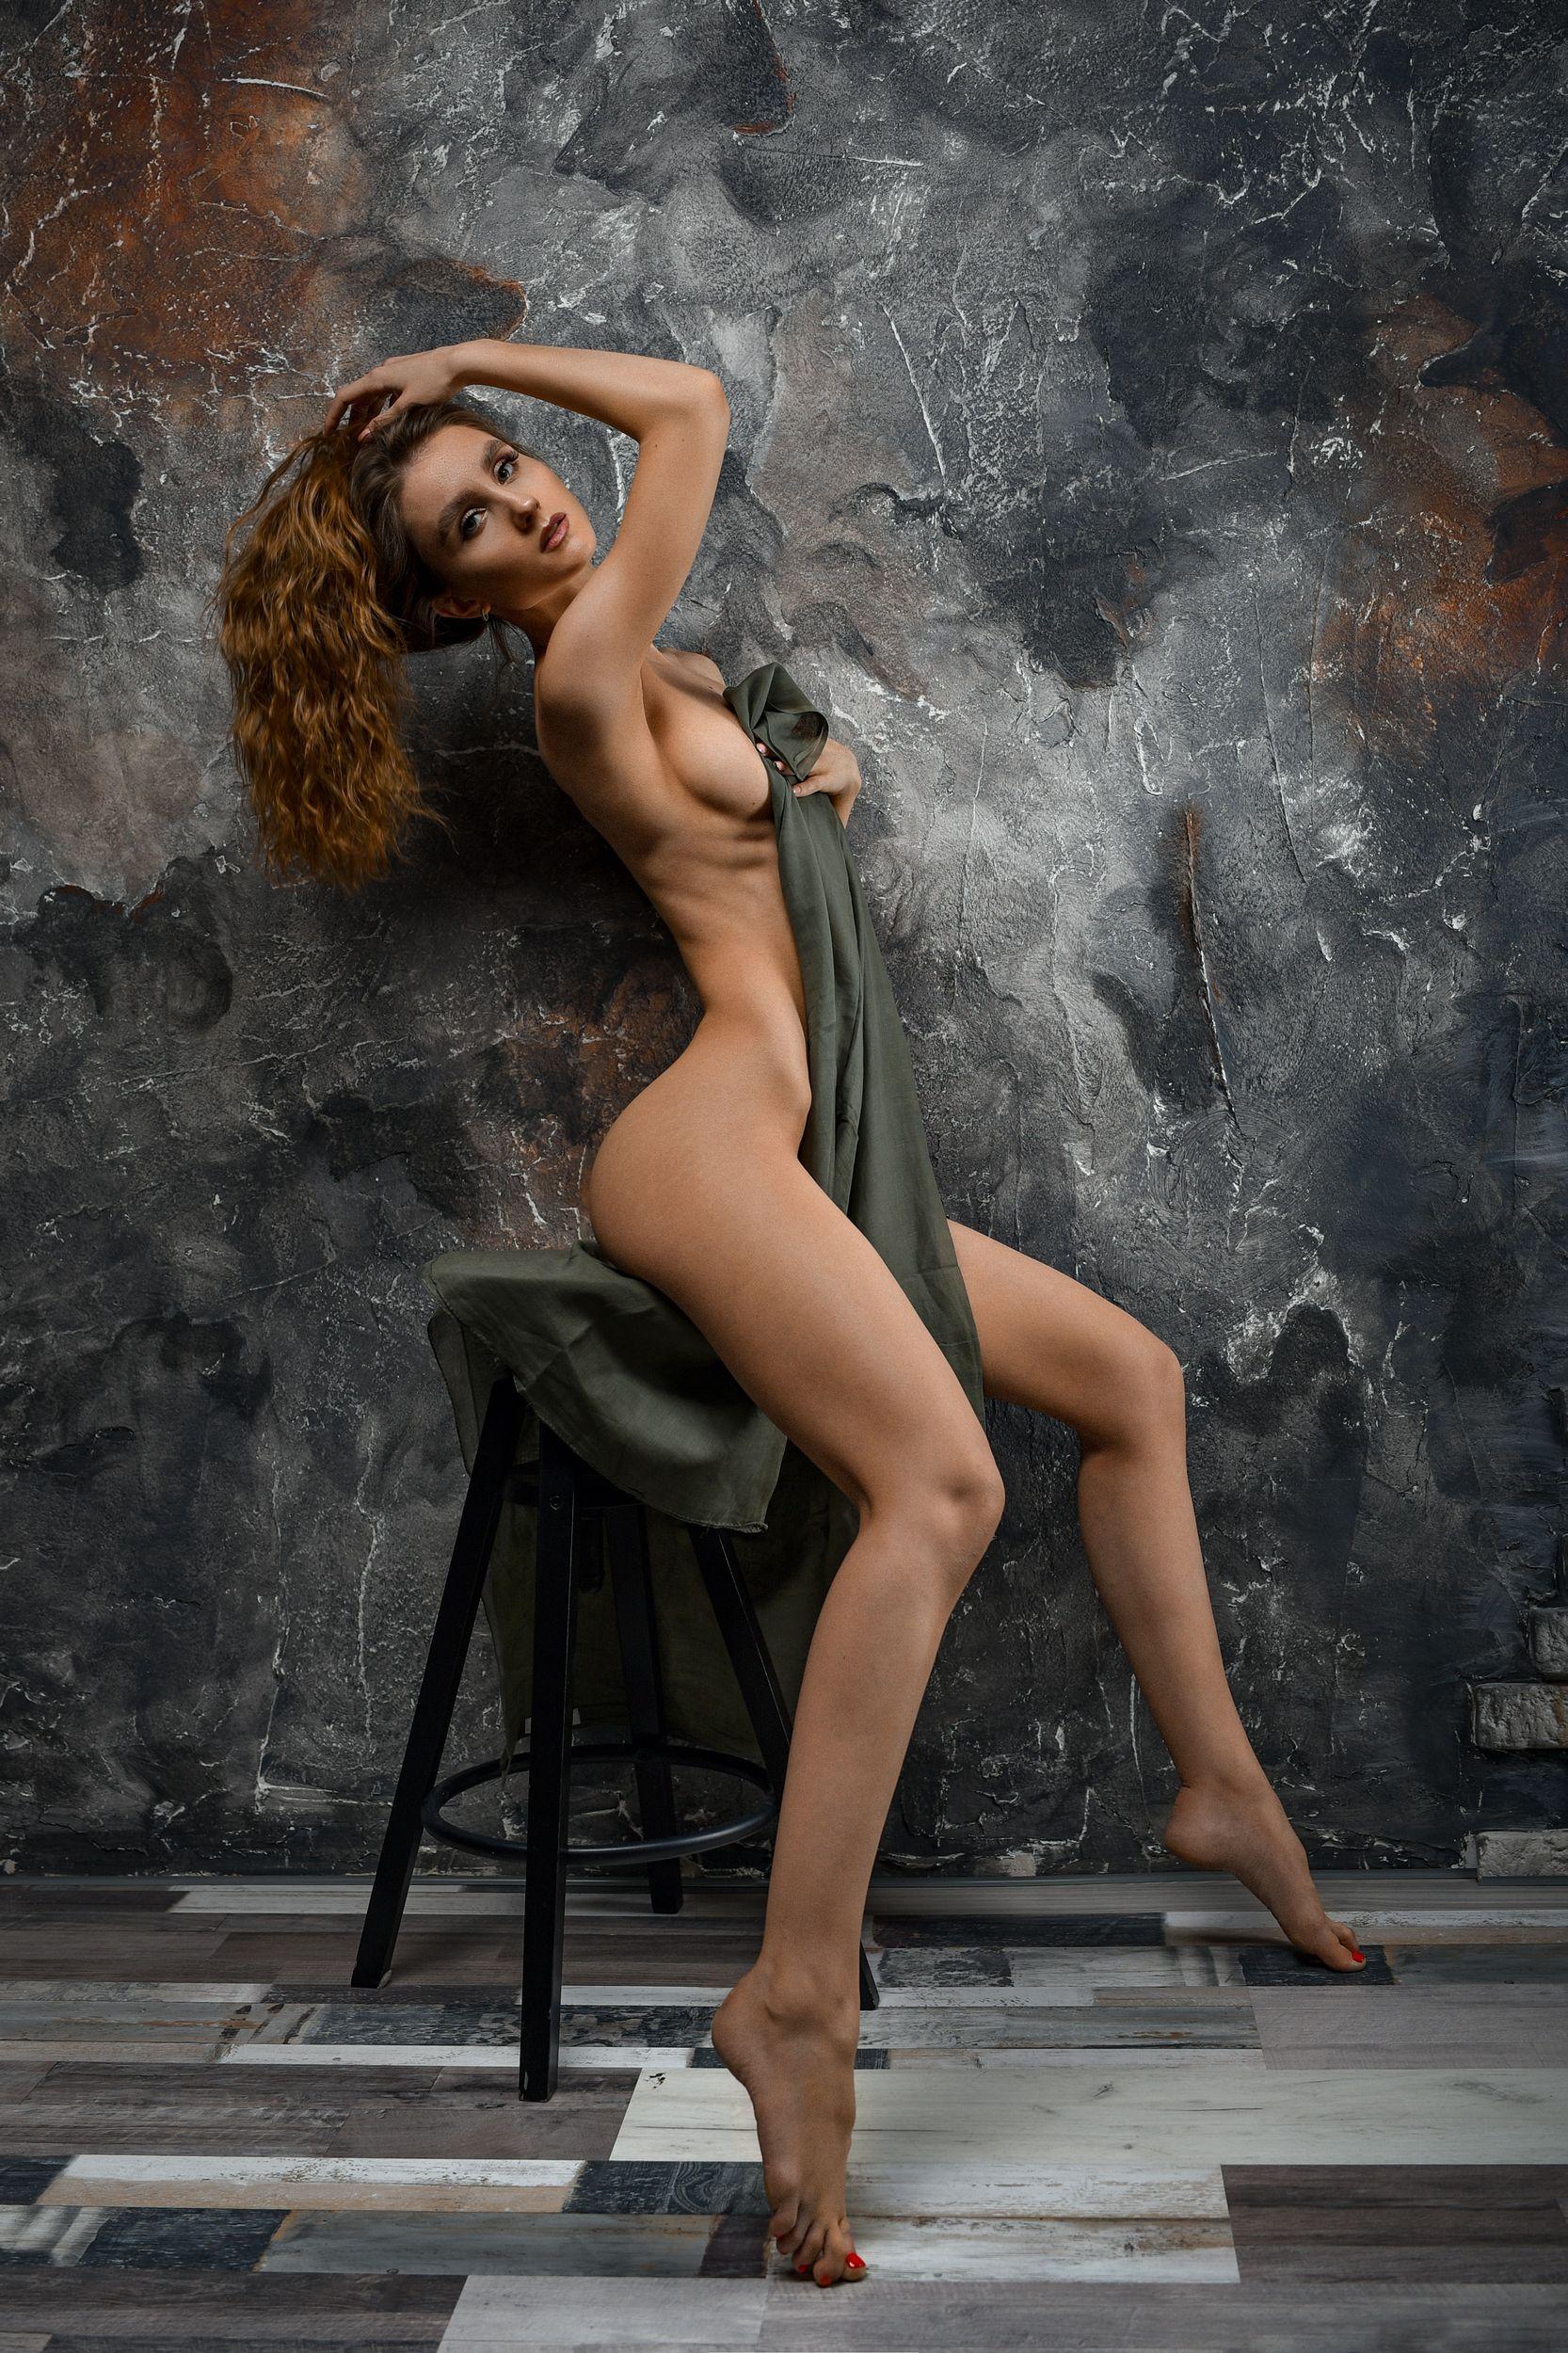 portrait girl at home red sexy, Медведь Дмитрий